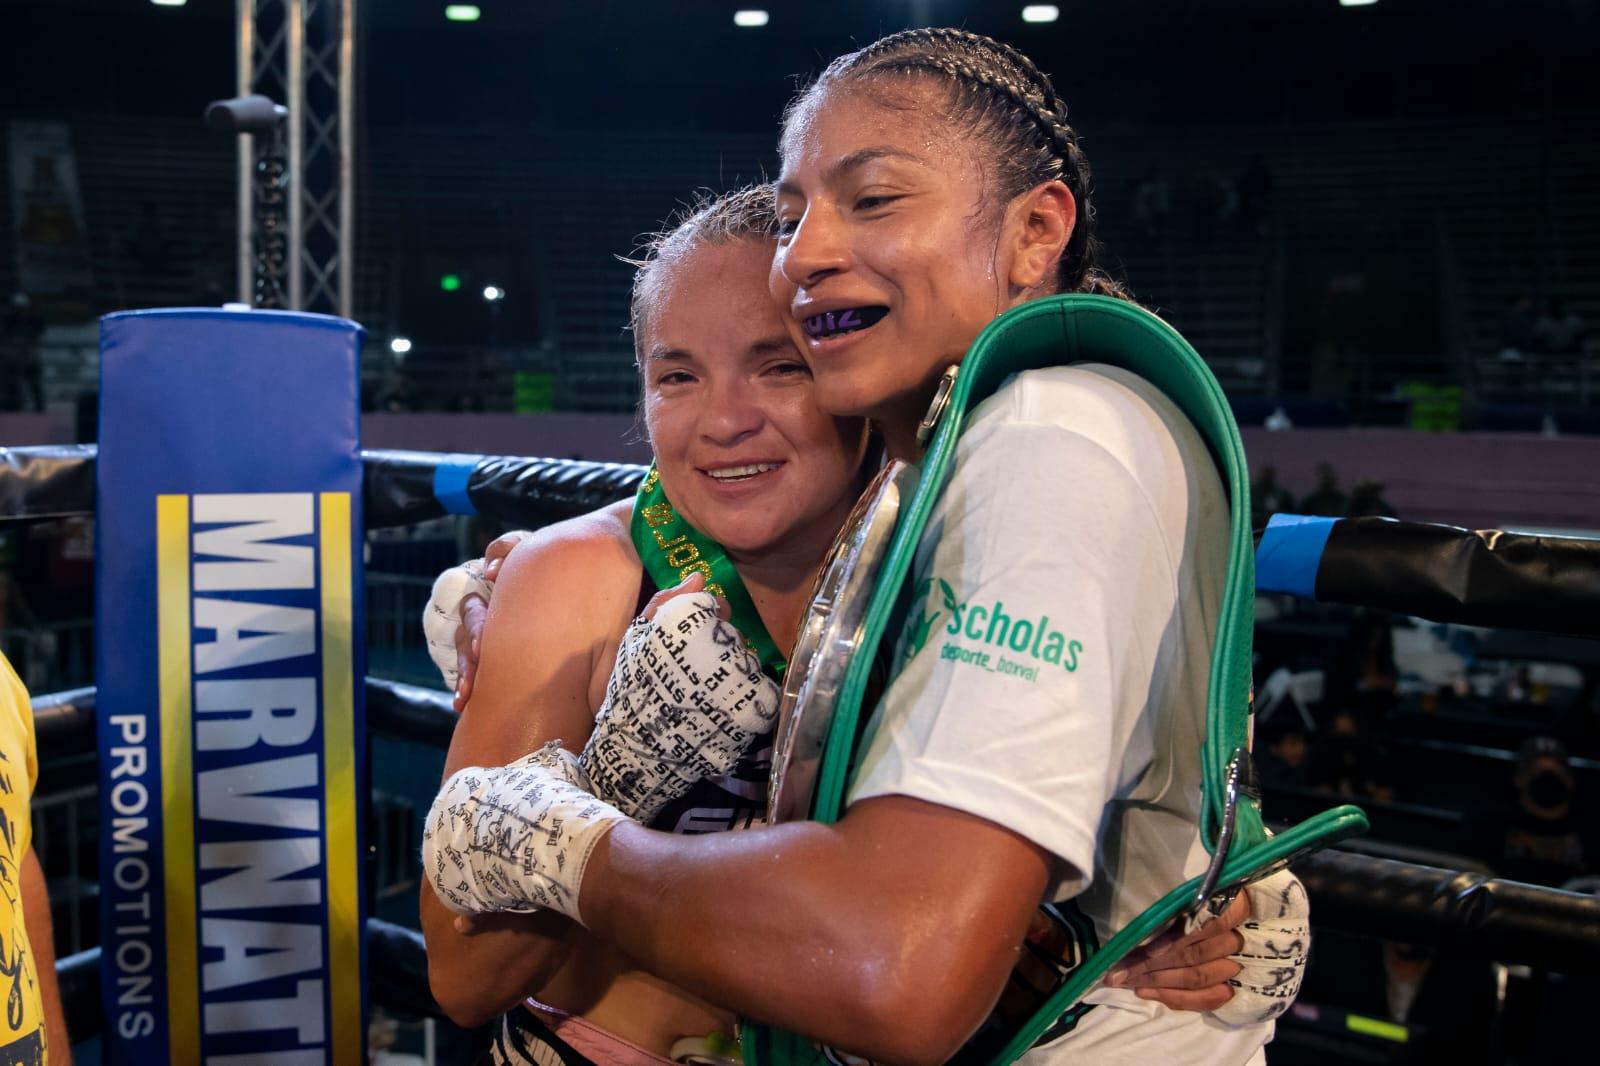 Adelaida Ruiz defeats Nancy Franco De Alba for WBC Silver Title   Boxen247.com (Kristian von Sponneck)